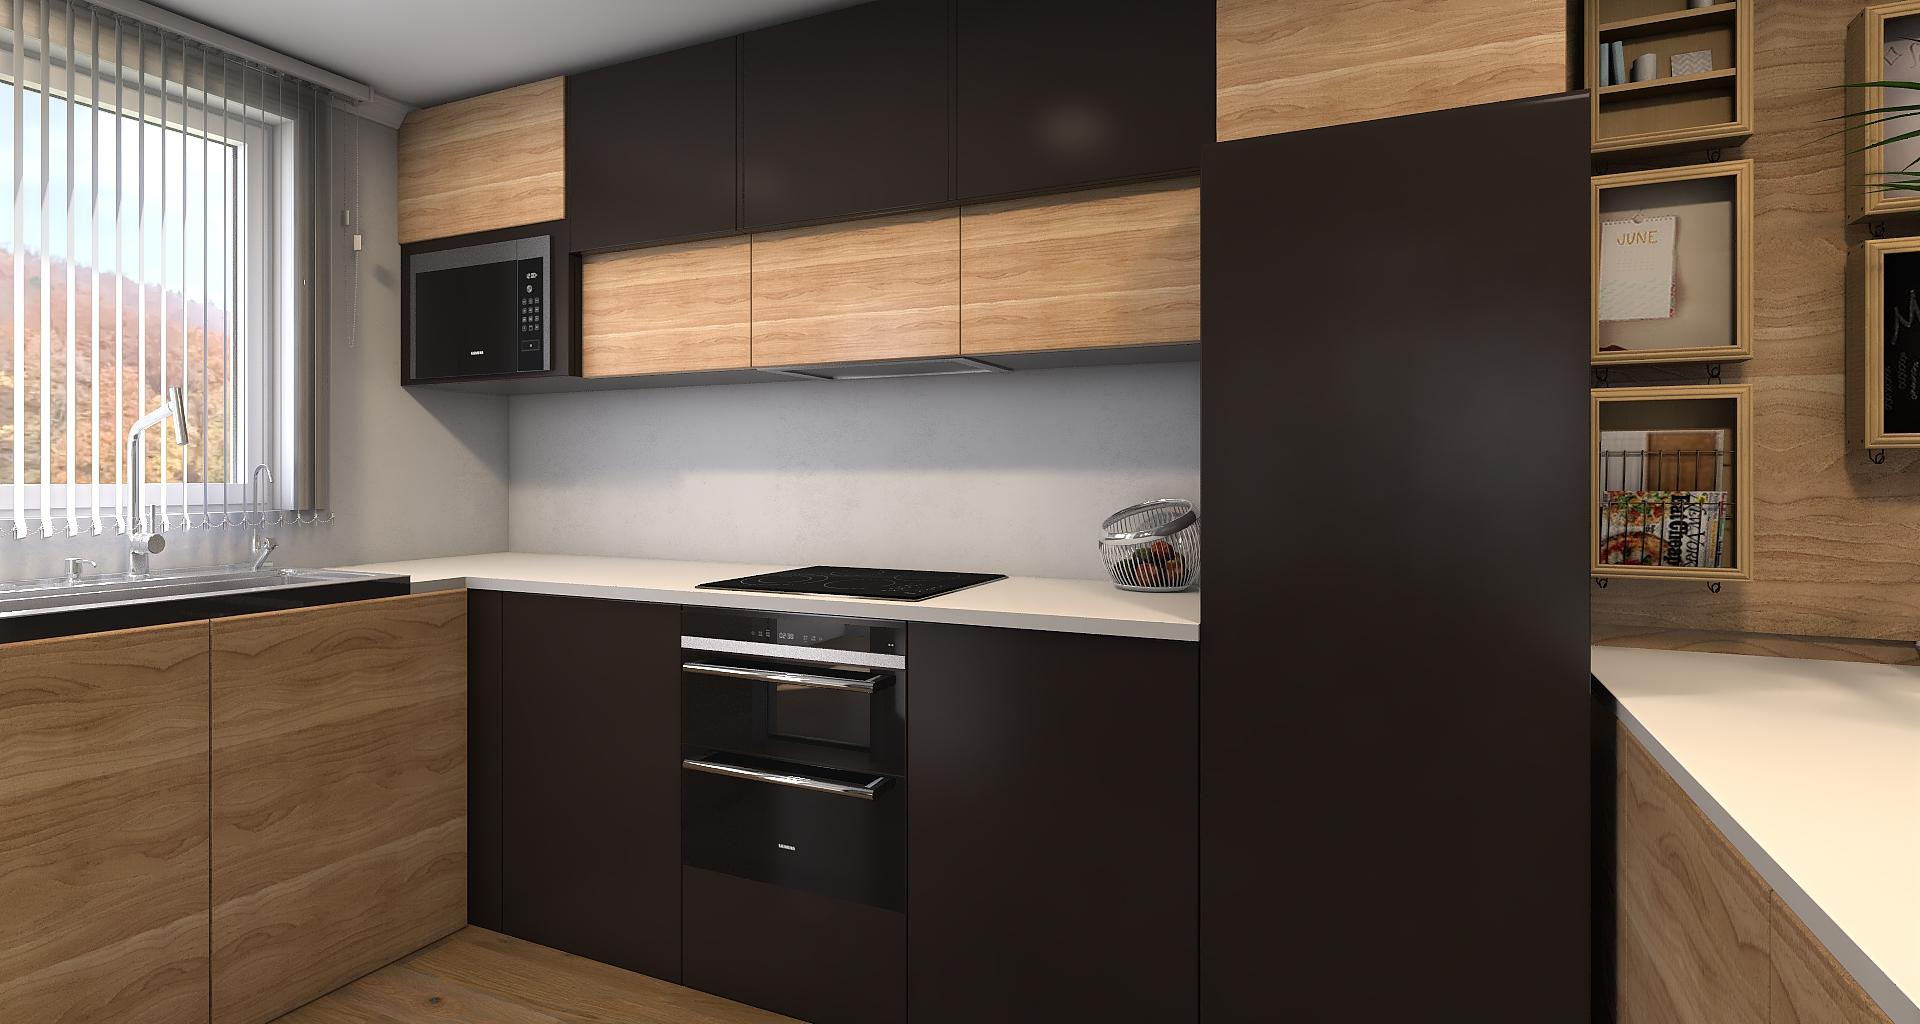 Cocina Negra Y Roble Claro Roble Claro Diseno De Cocina Diseno De Interiores